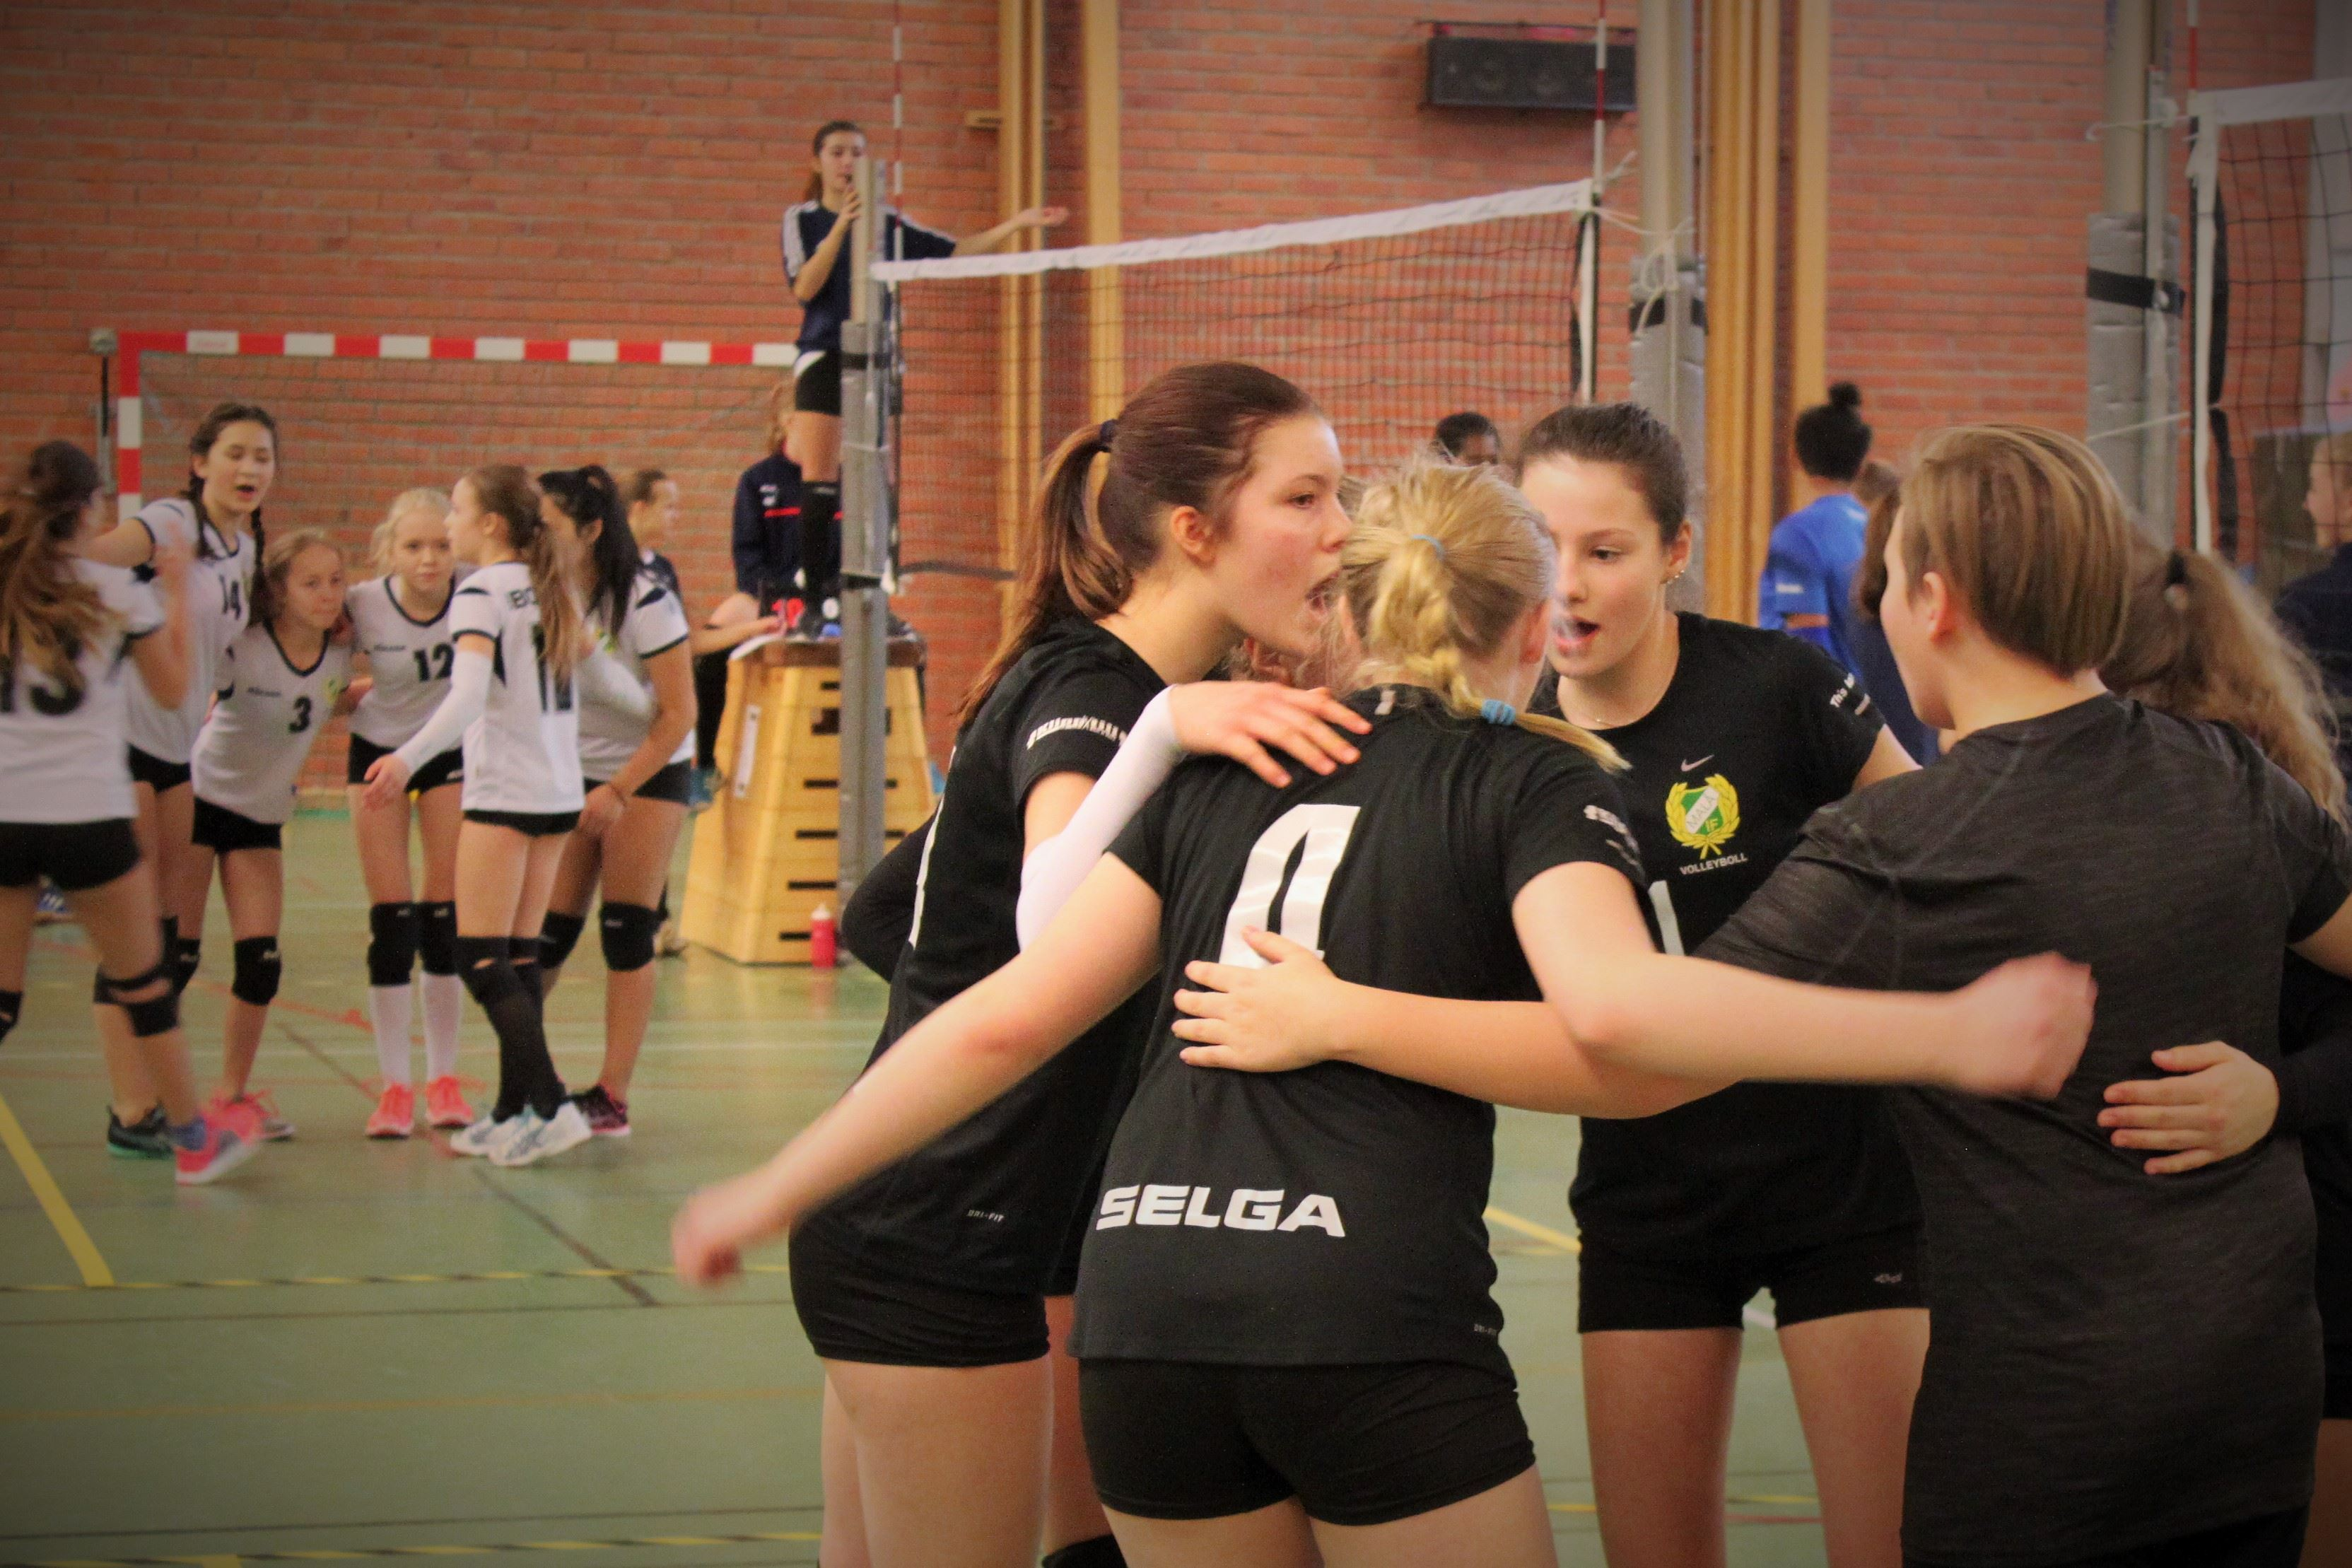 Malåcupen - volleyboll ungdom